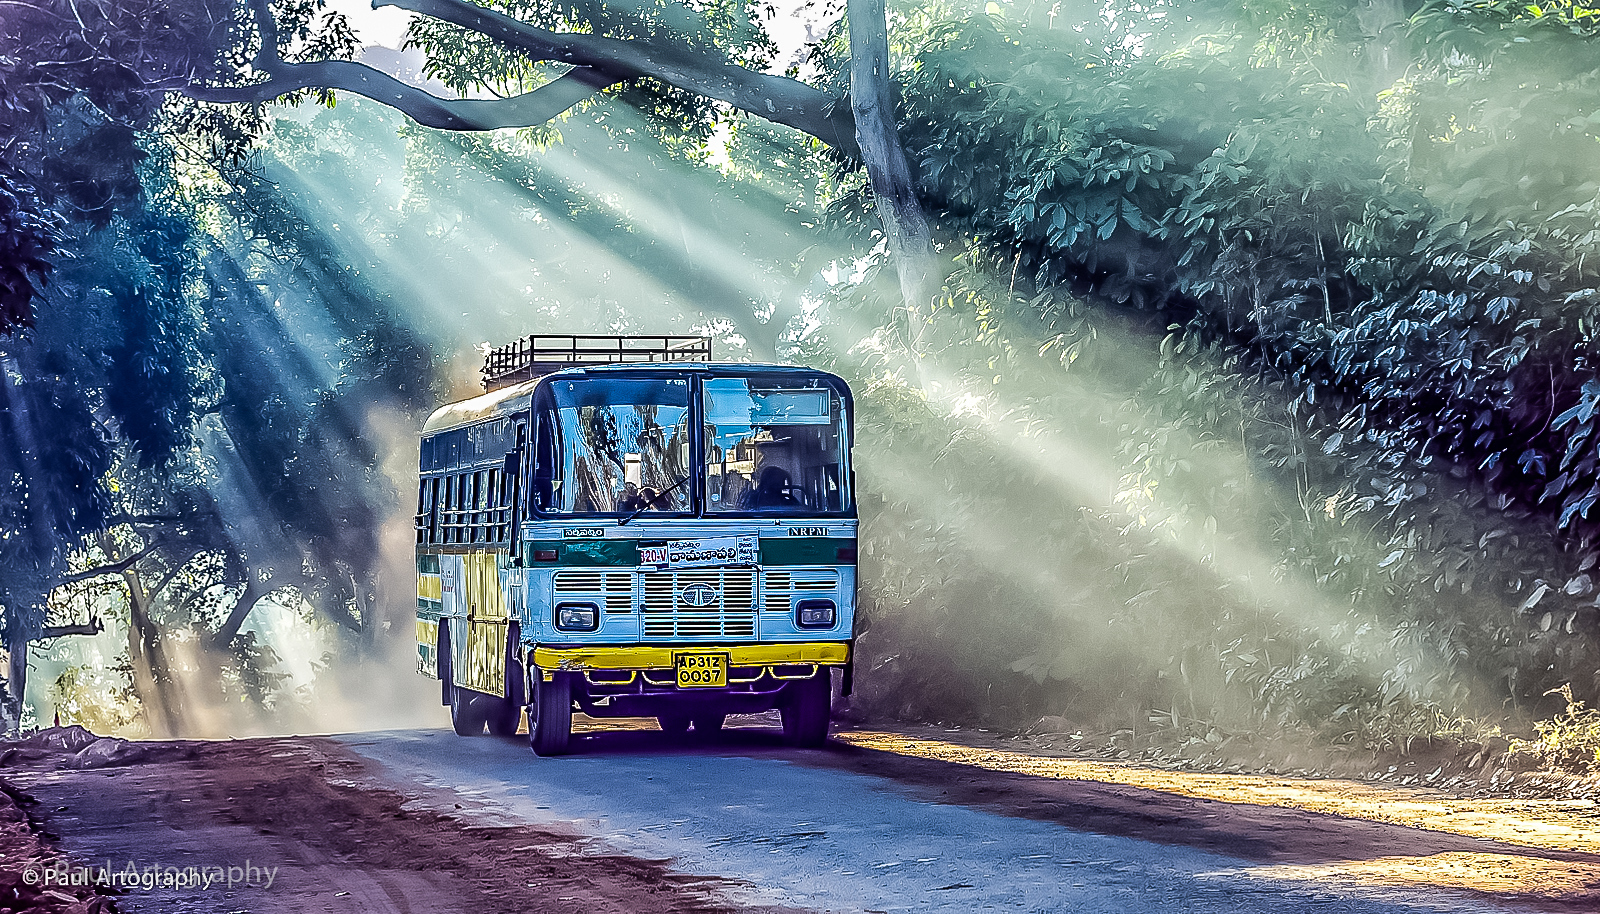 Bus at Lambasingi